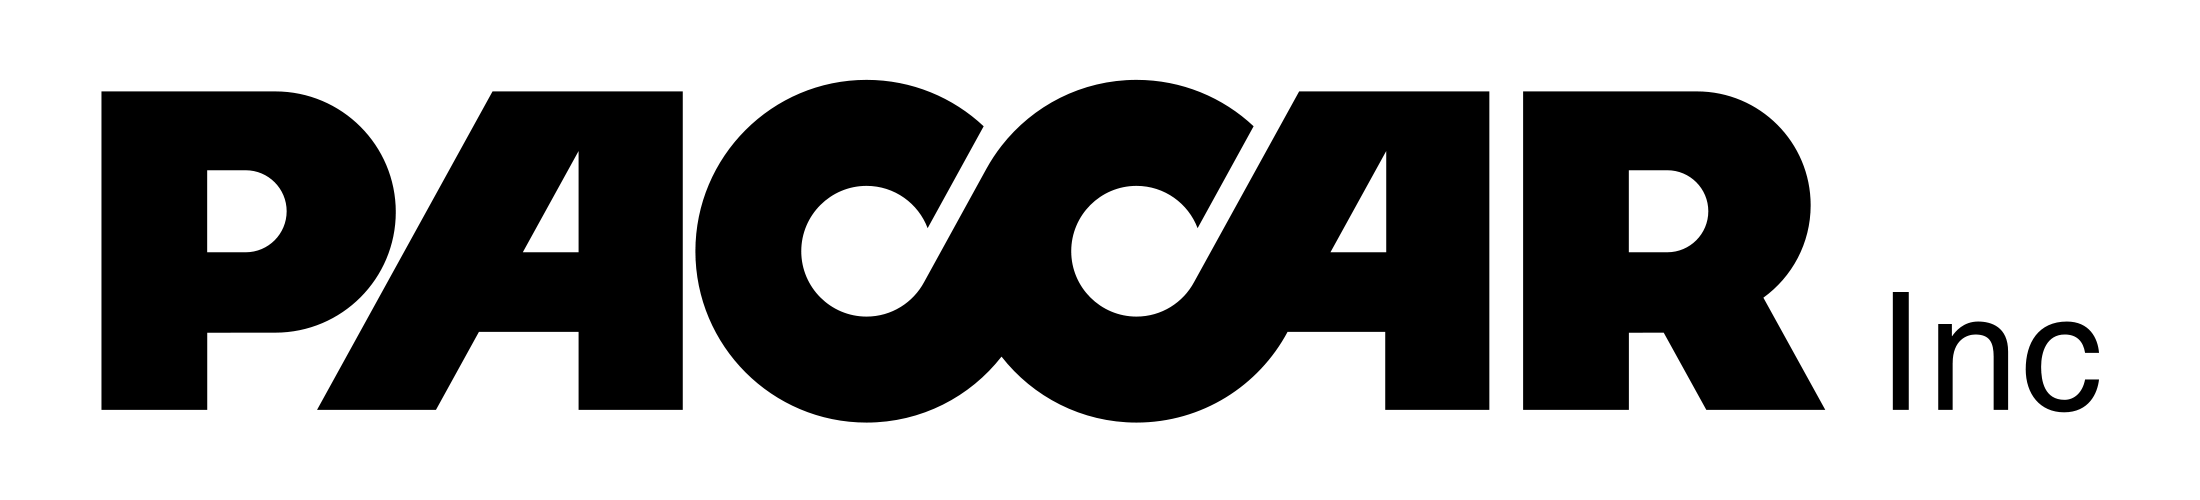 Paccar Logo Hd Png Information Carlogos Org